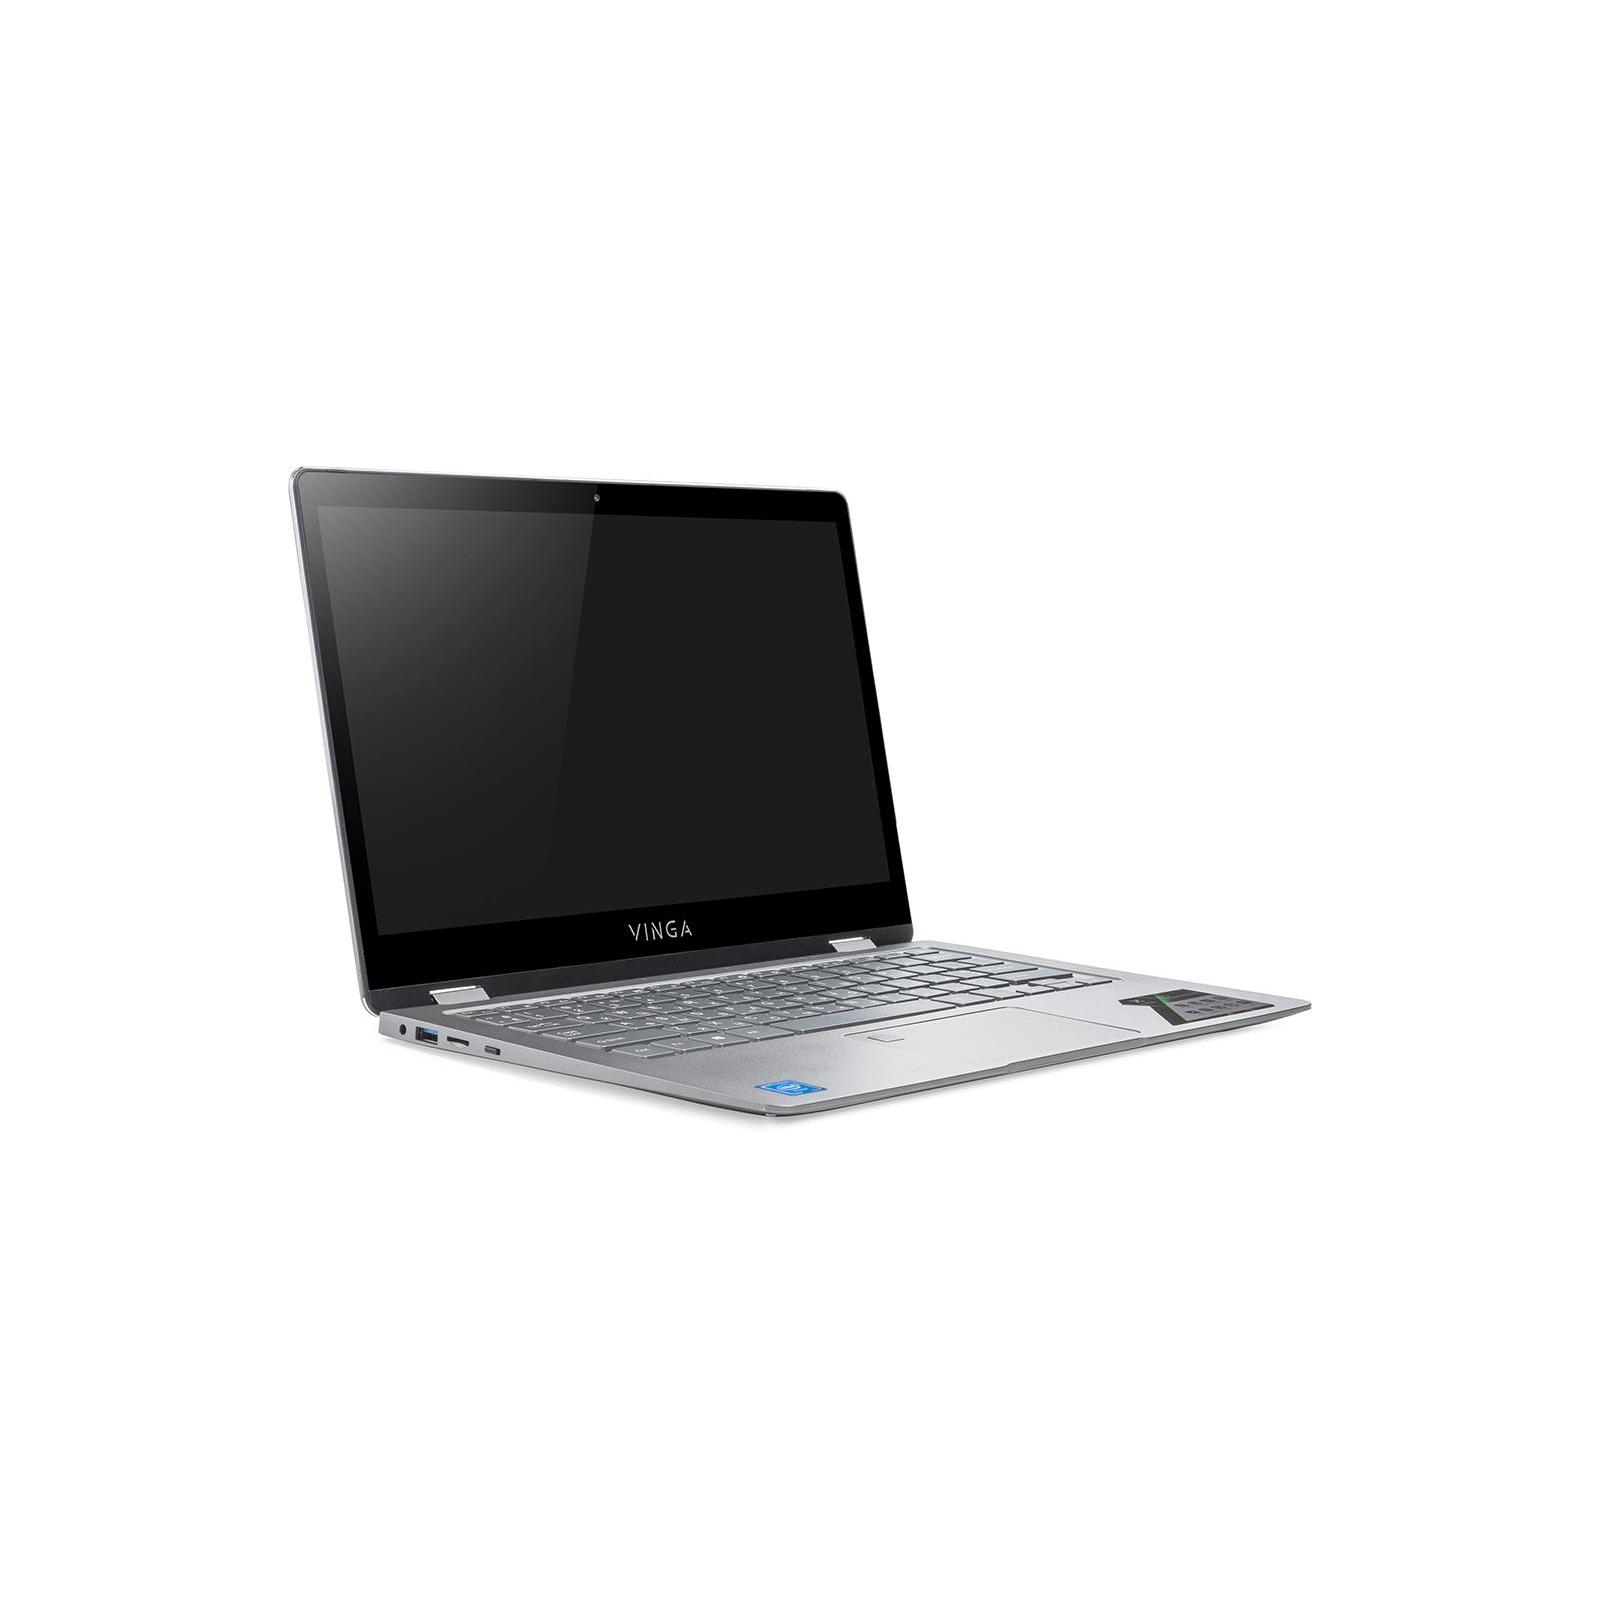 Ноутбук Vinga Twizzle Pen J133 (J133-C33464PS) изображение 4